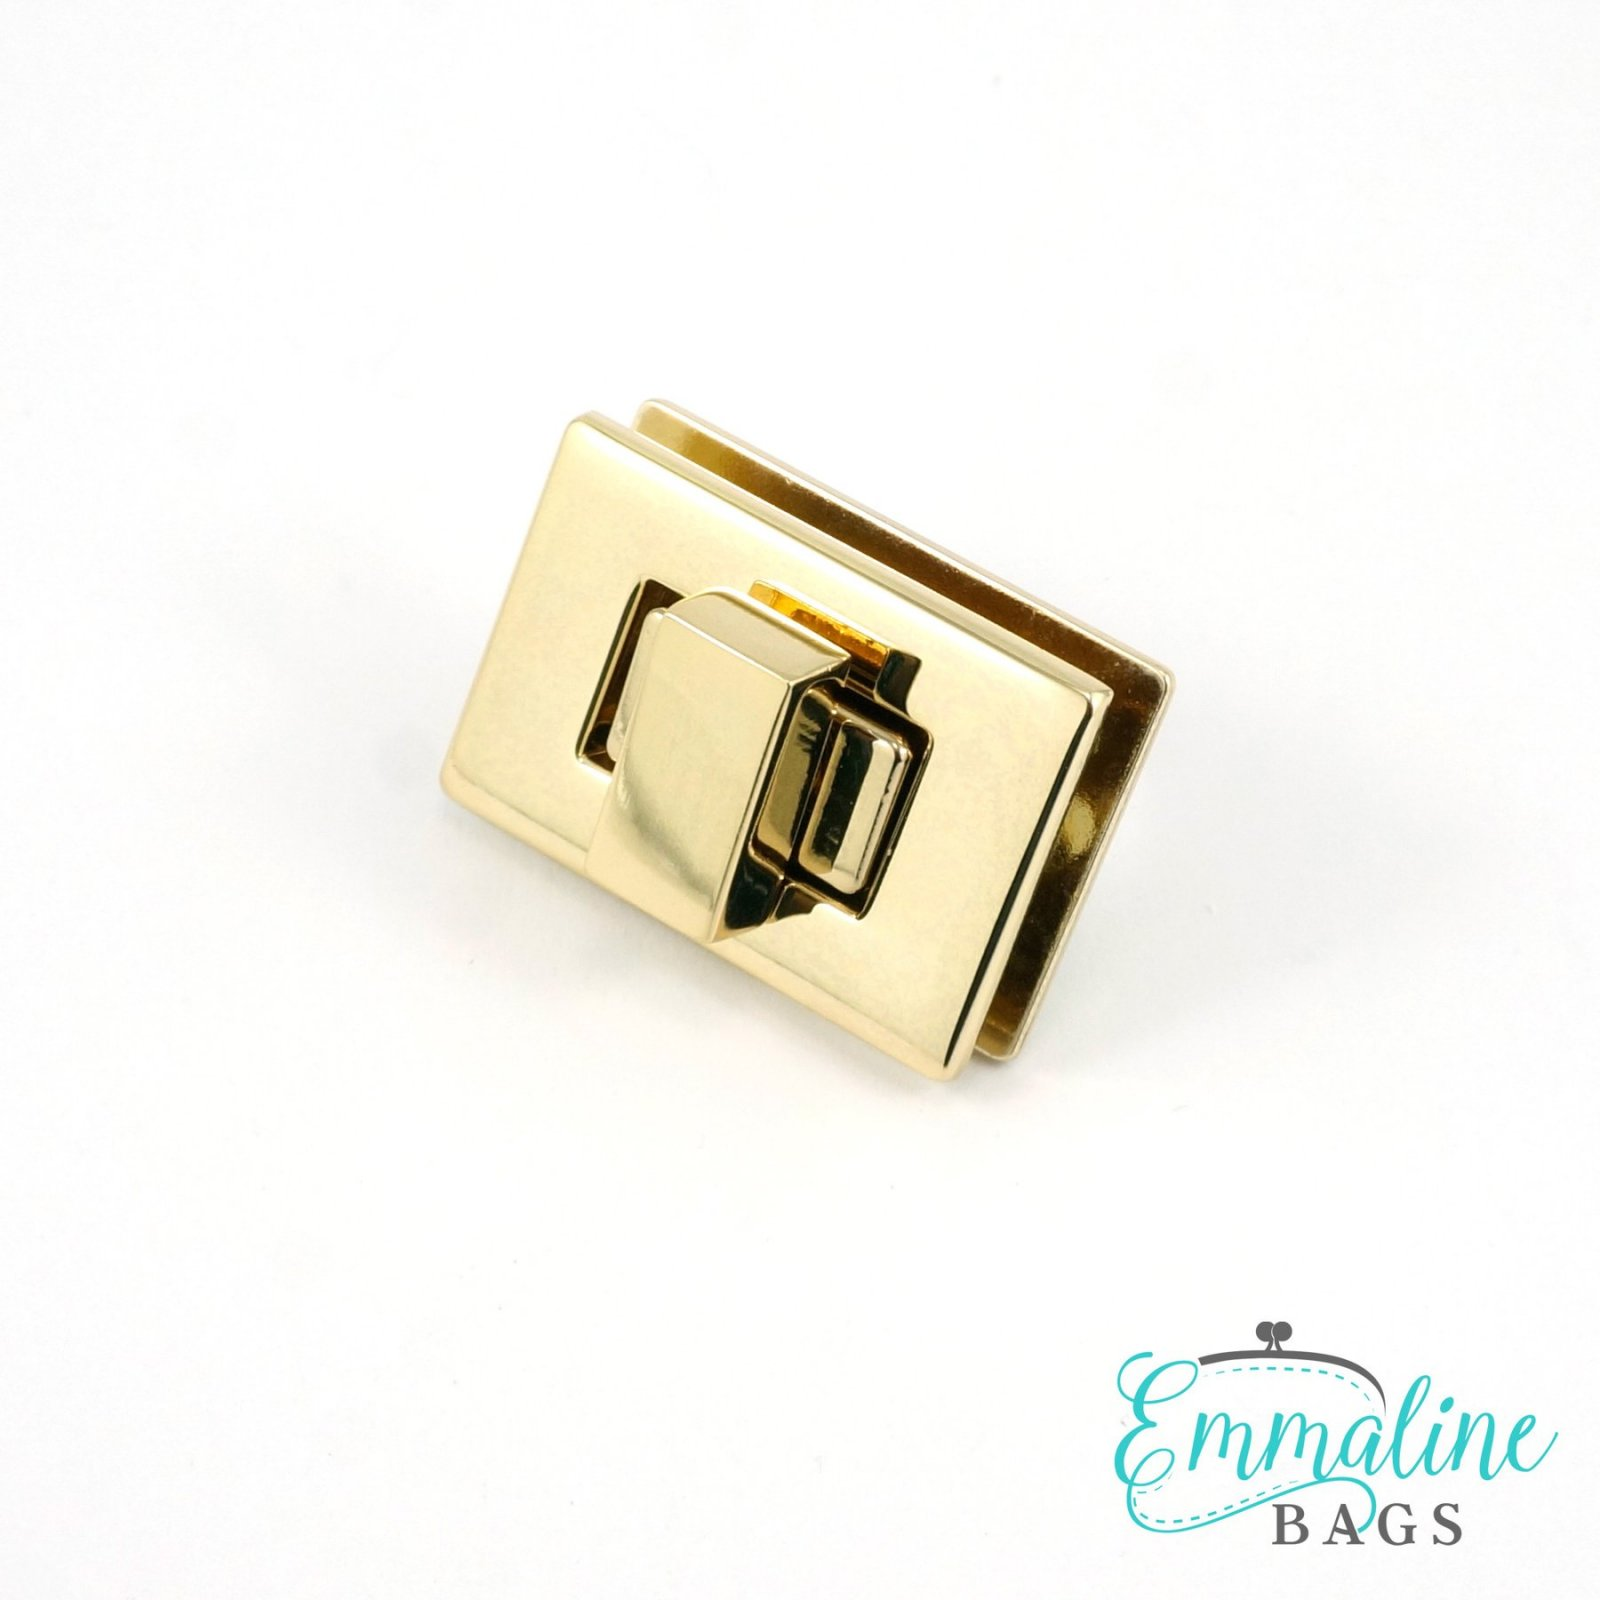 Rectangular Bag Lock 1.5 - Gold